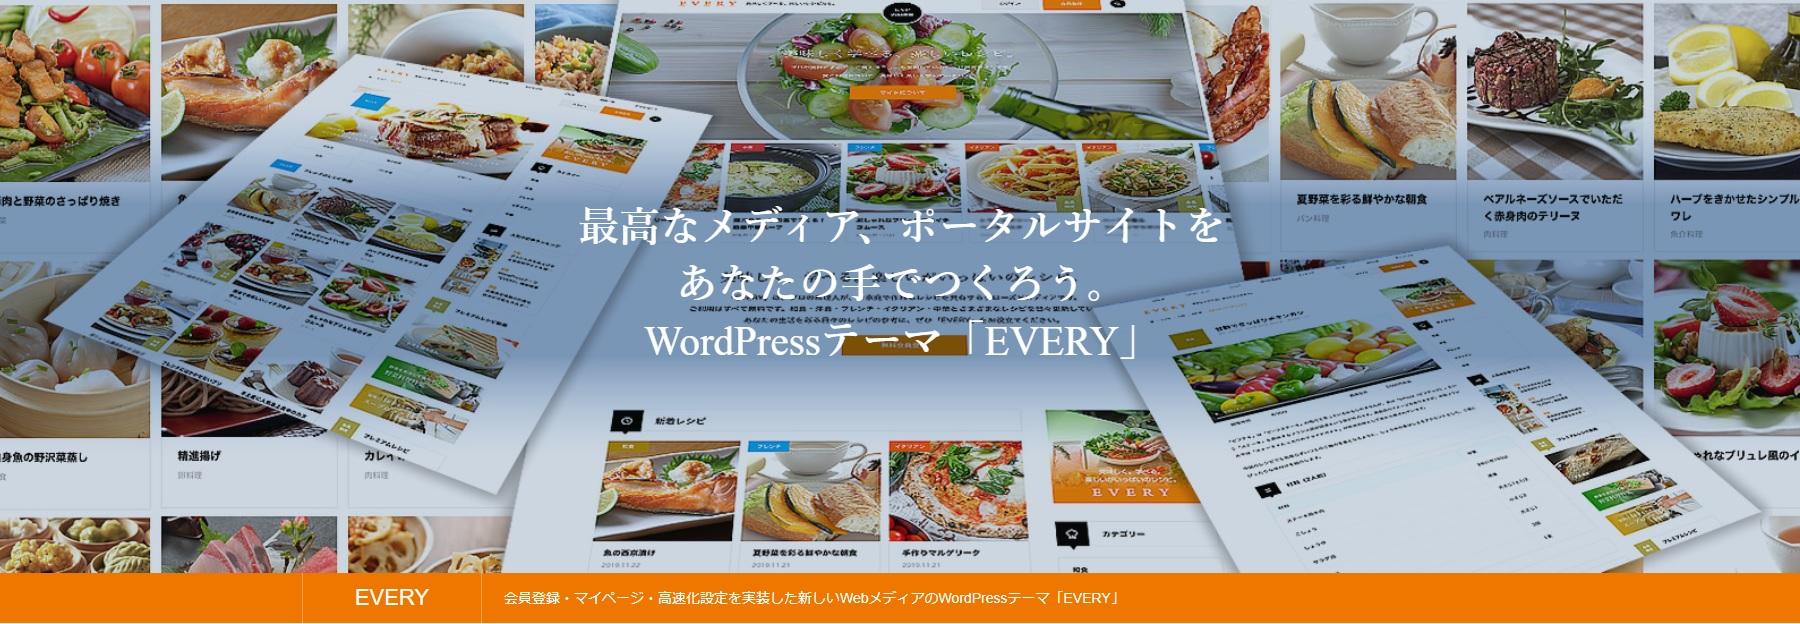 WordPressテーマ「EVERY」TCD075の評判・評価・口コミ【有料日本語ワードプレステンプレート】